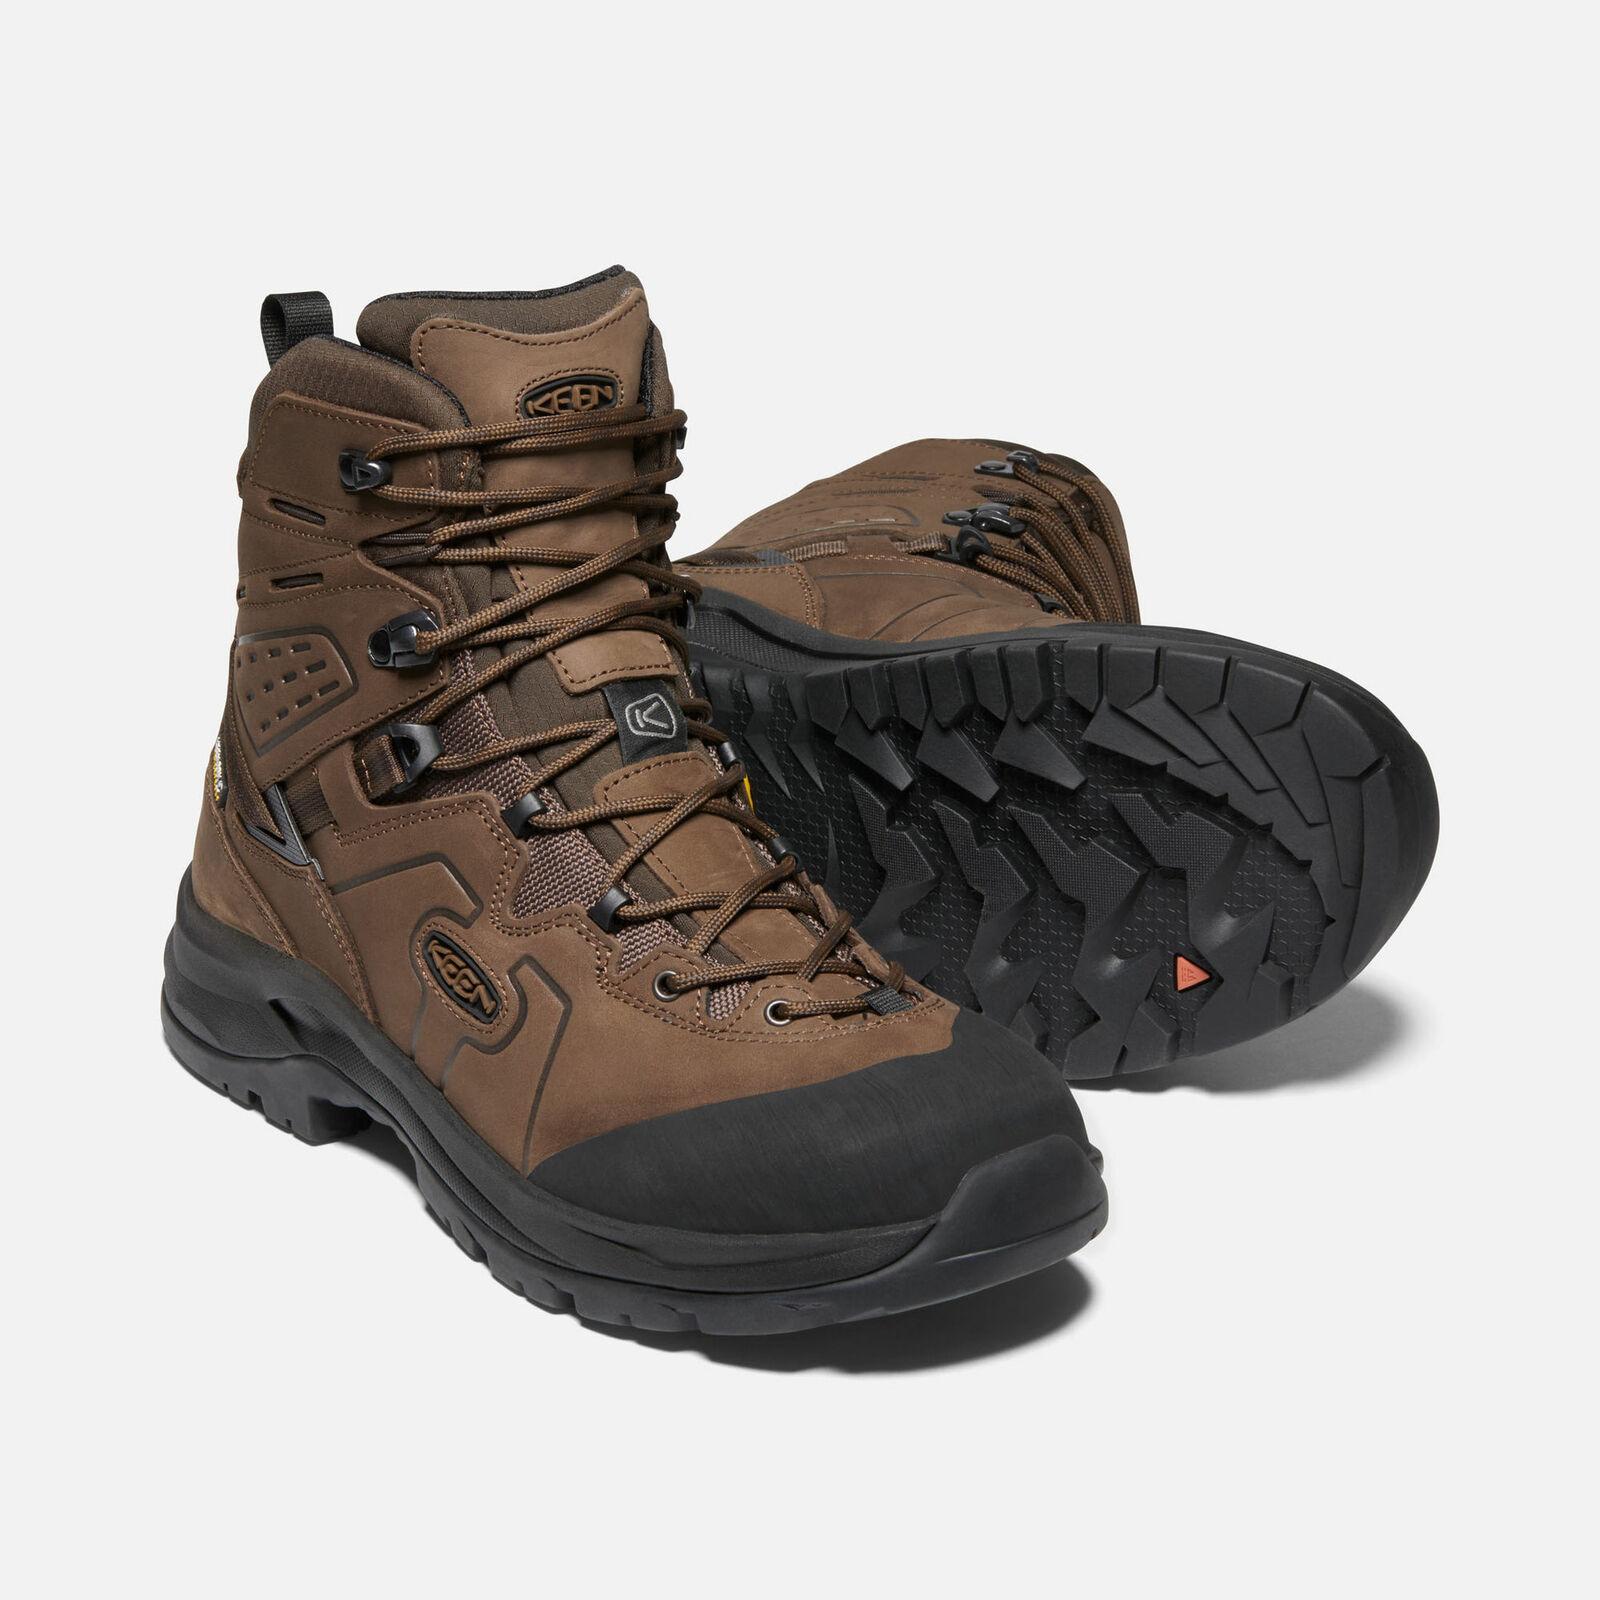 Keen Men's Karraig WP Walking Boots (Dark Earth Raven)